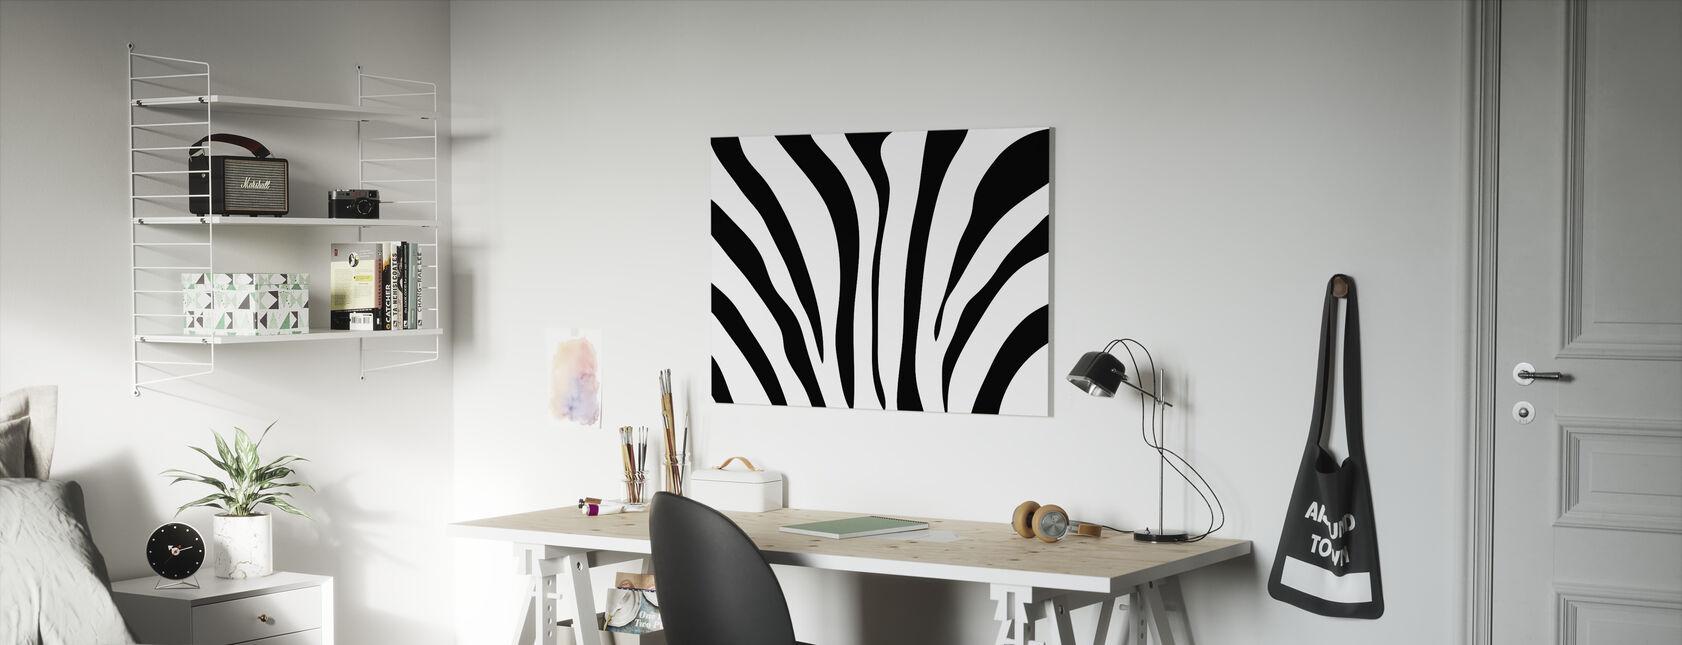 Zebra textur - Canvastavla - Barnrum